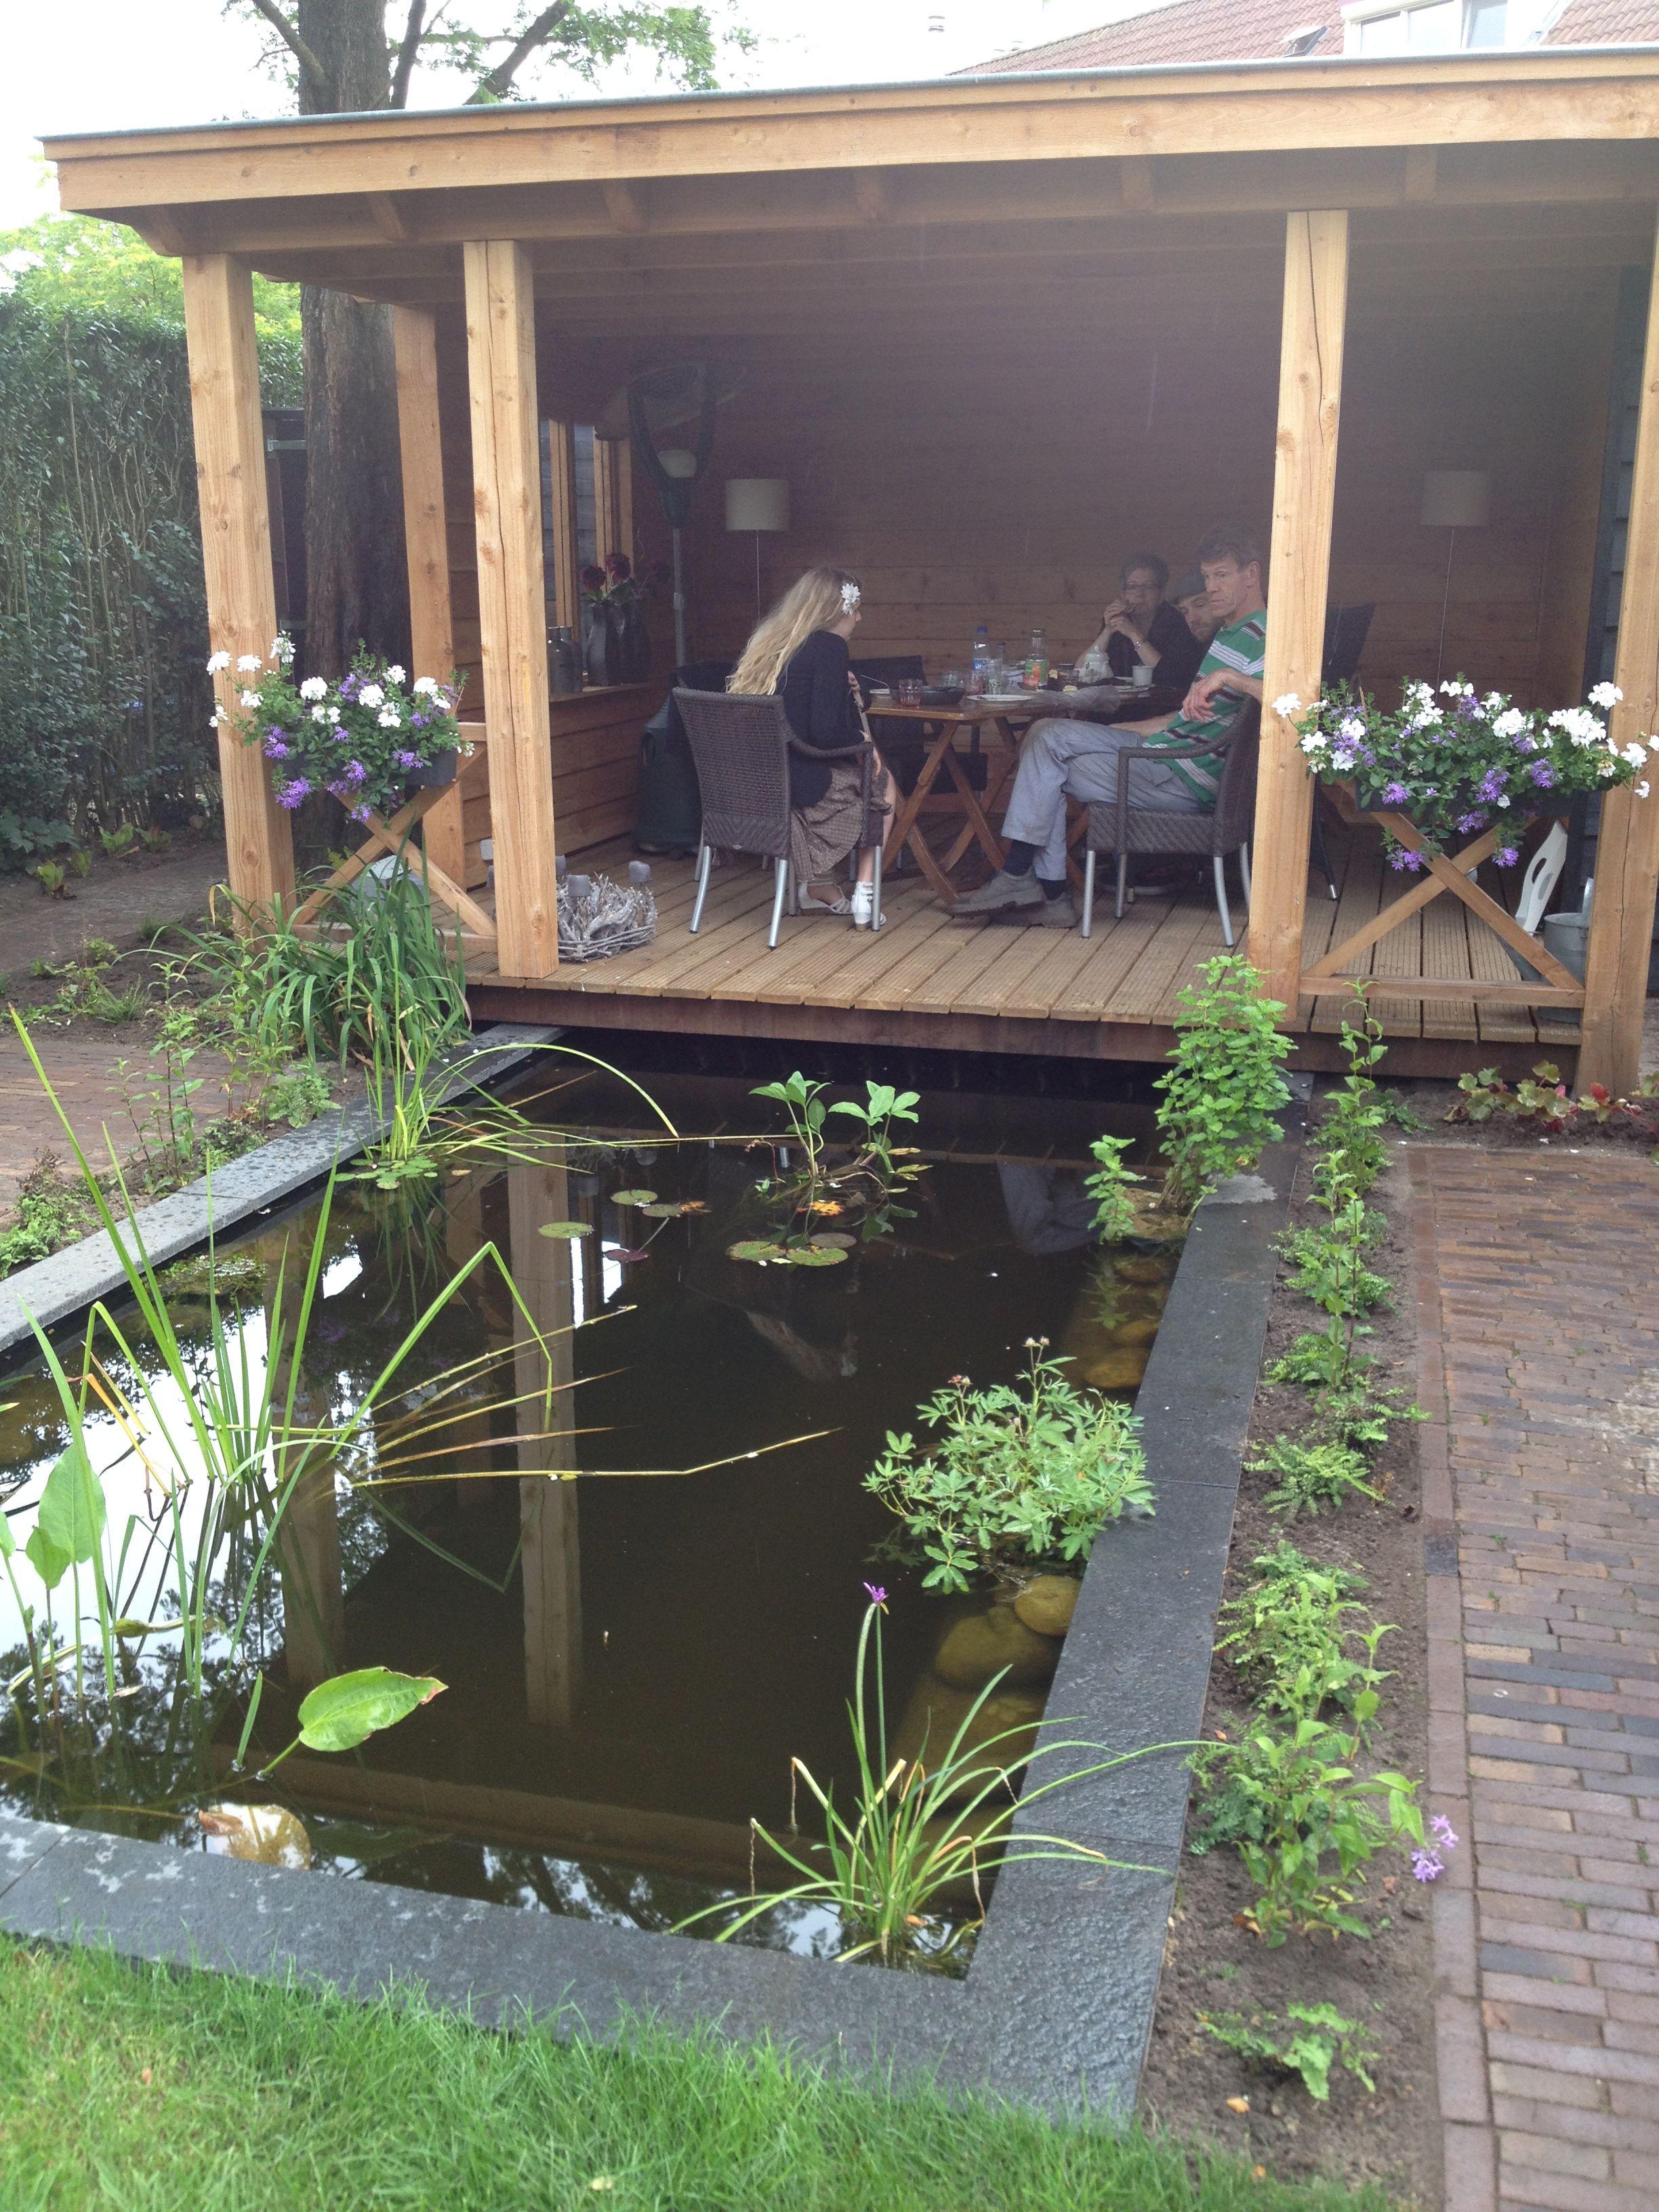 End Of Garden // Pond // Wooden Deck // Wood Deck Over Pond